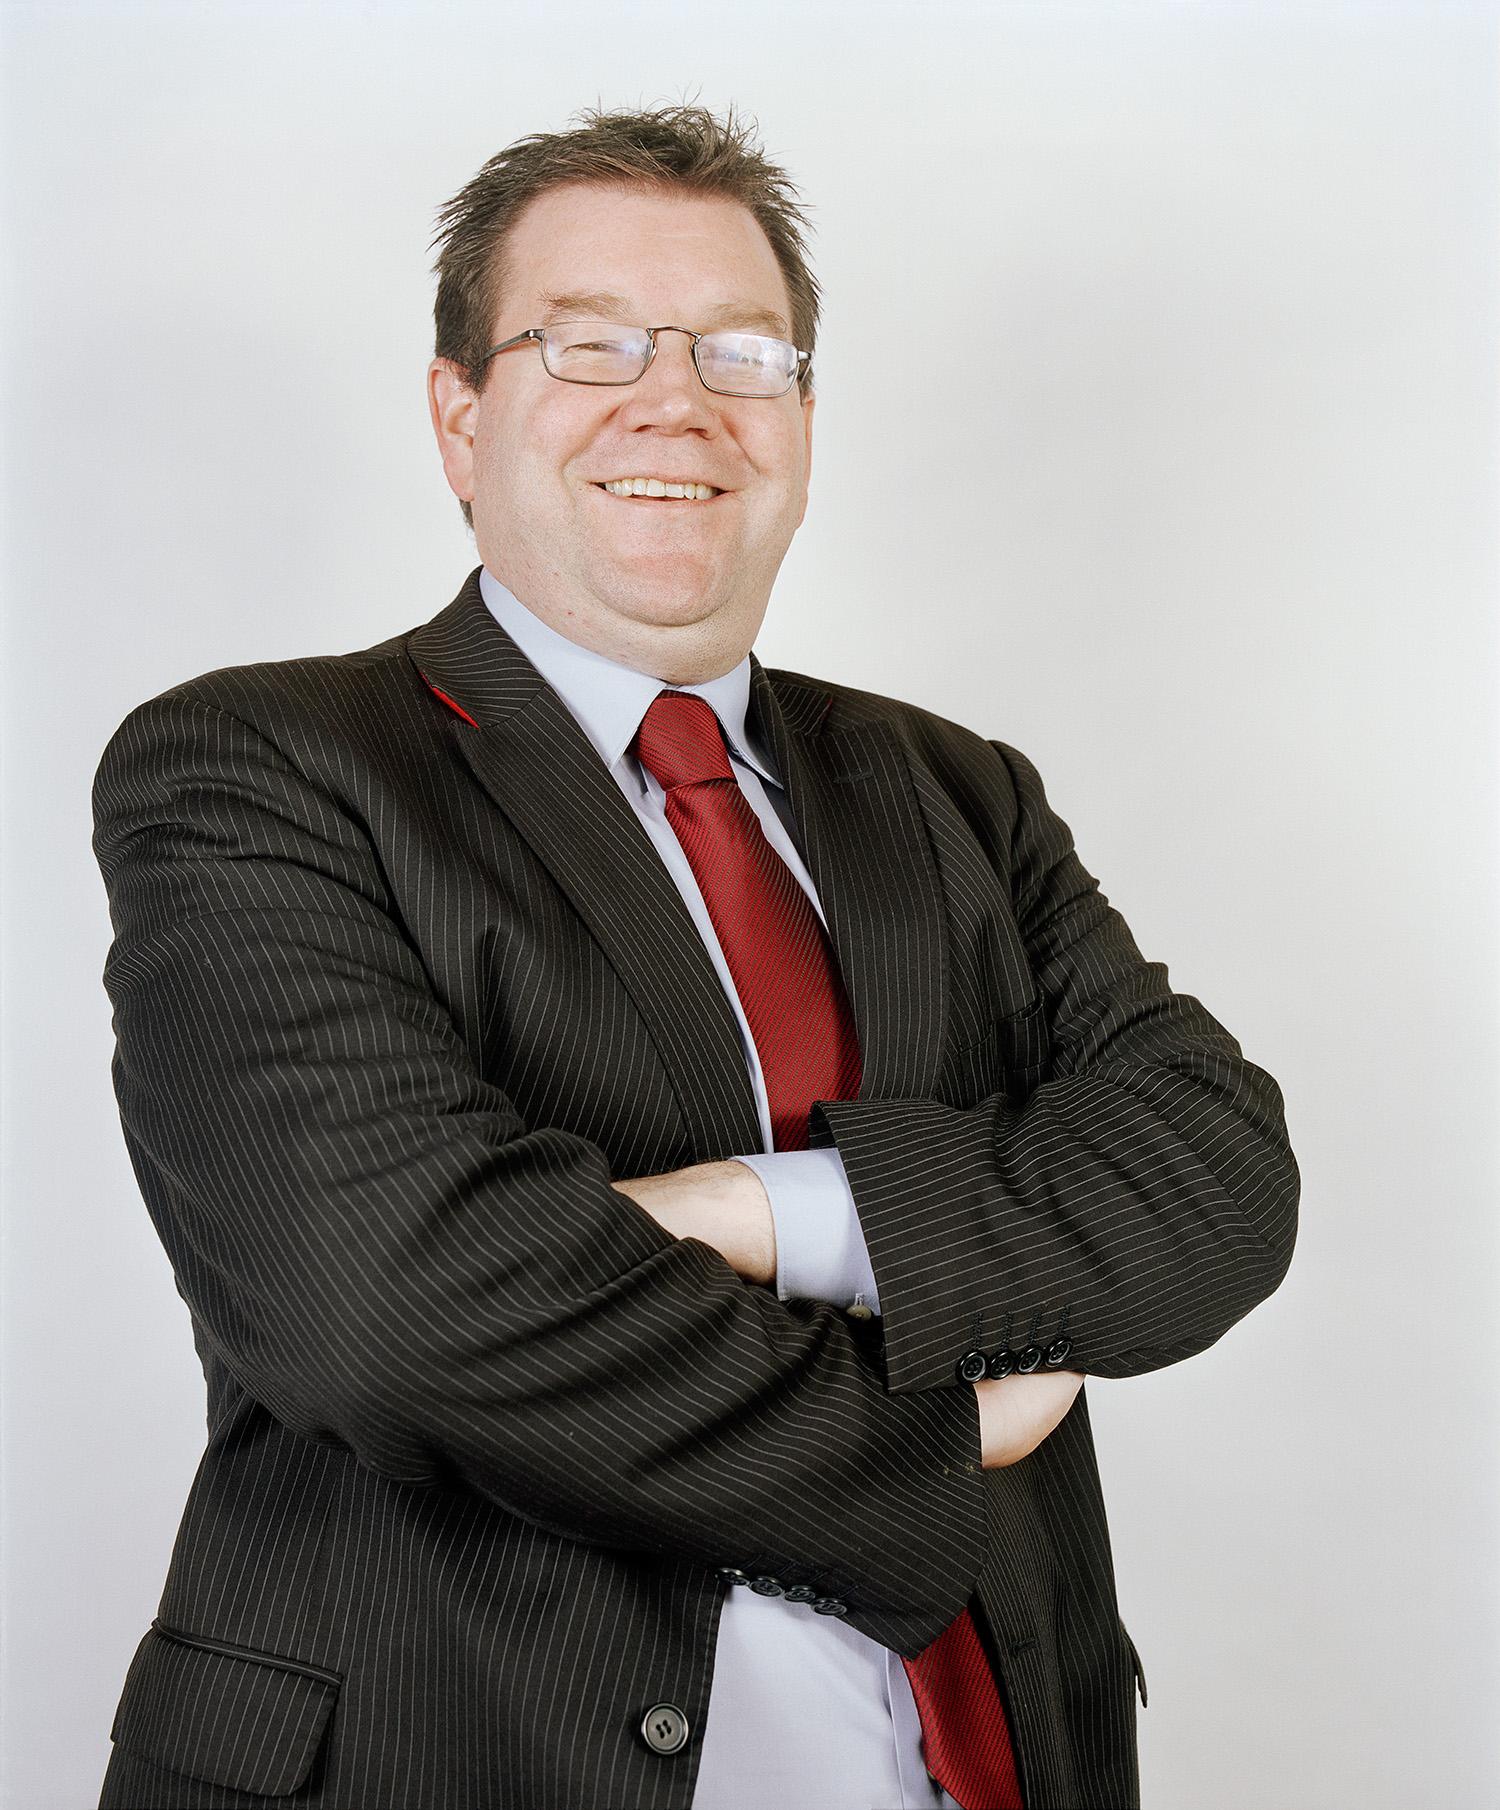 Grant Robertson